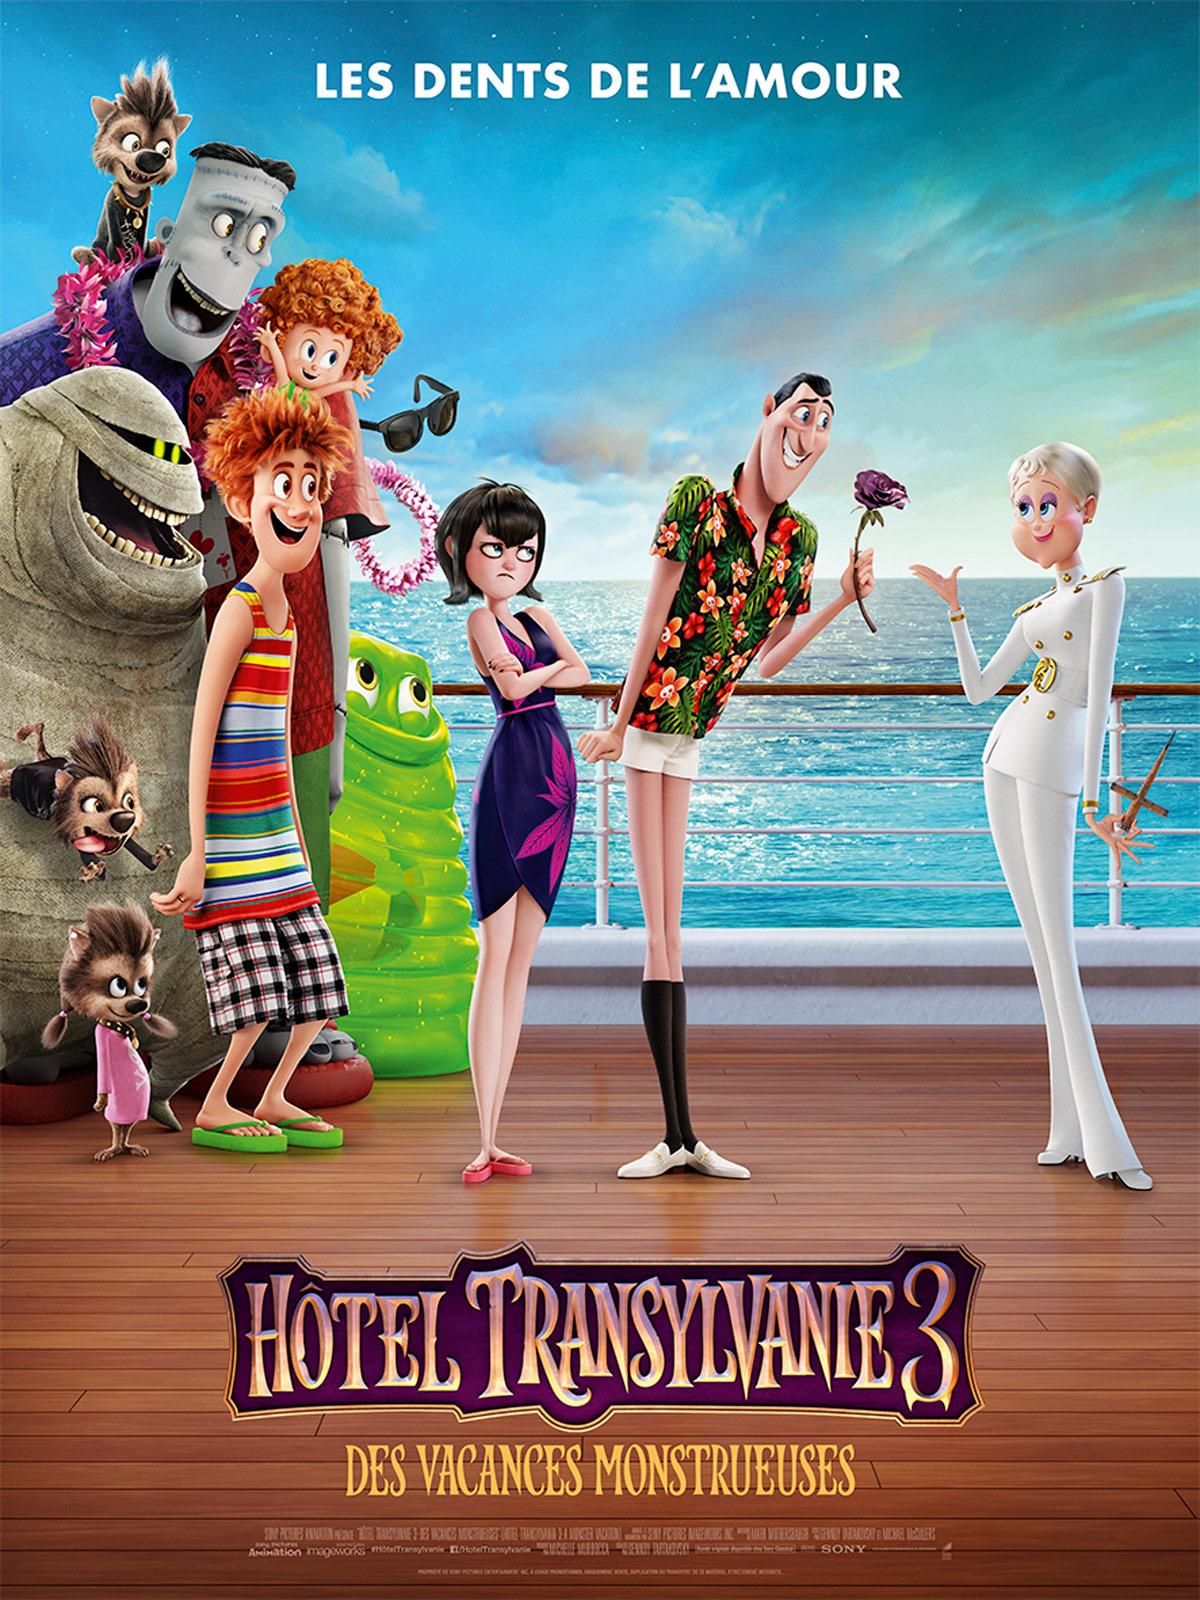 Hotel Transylvanie 3 Streaming : hotel, transylvanie, streaming, Achat, Hôtel, Transylvanie, Vacances, Monstrueuses, AlloCiné